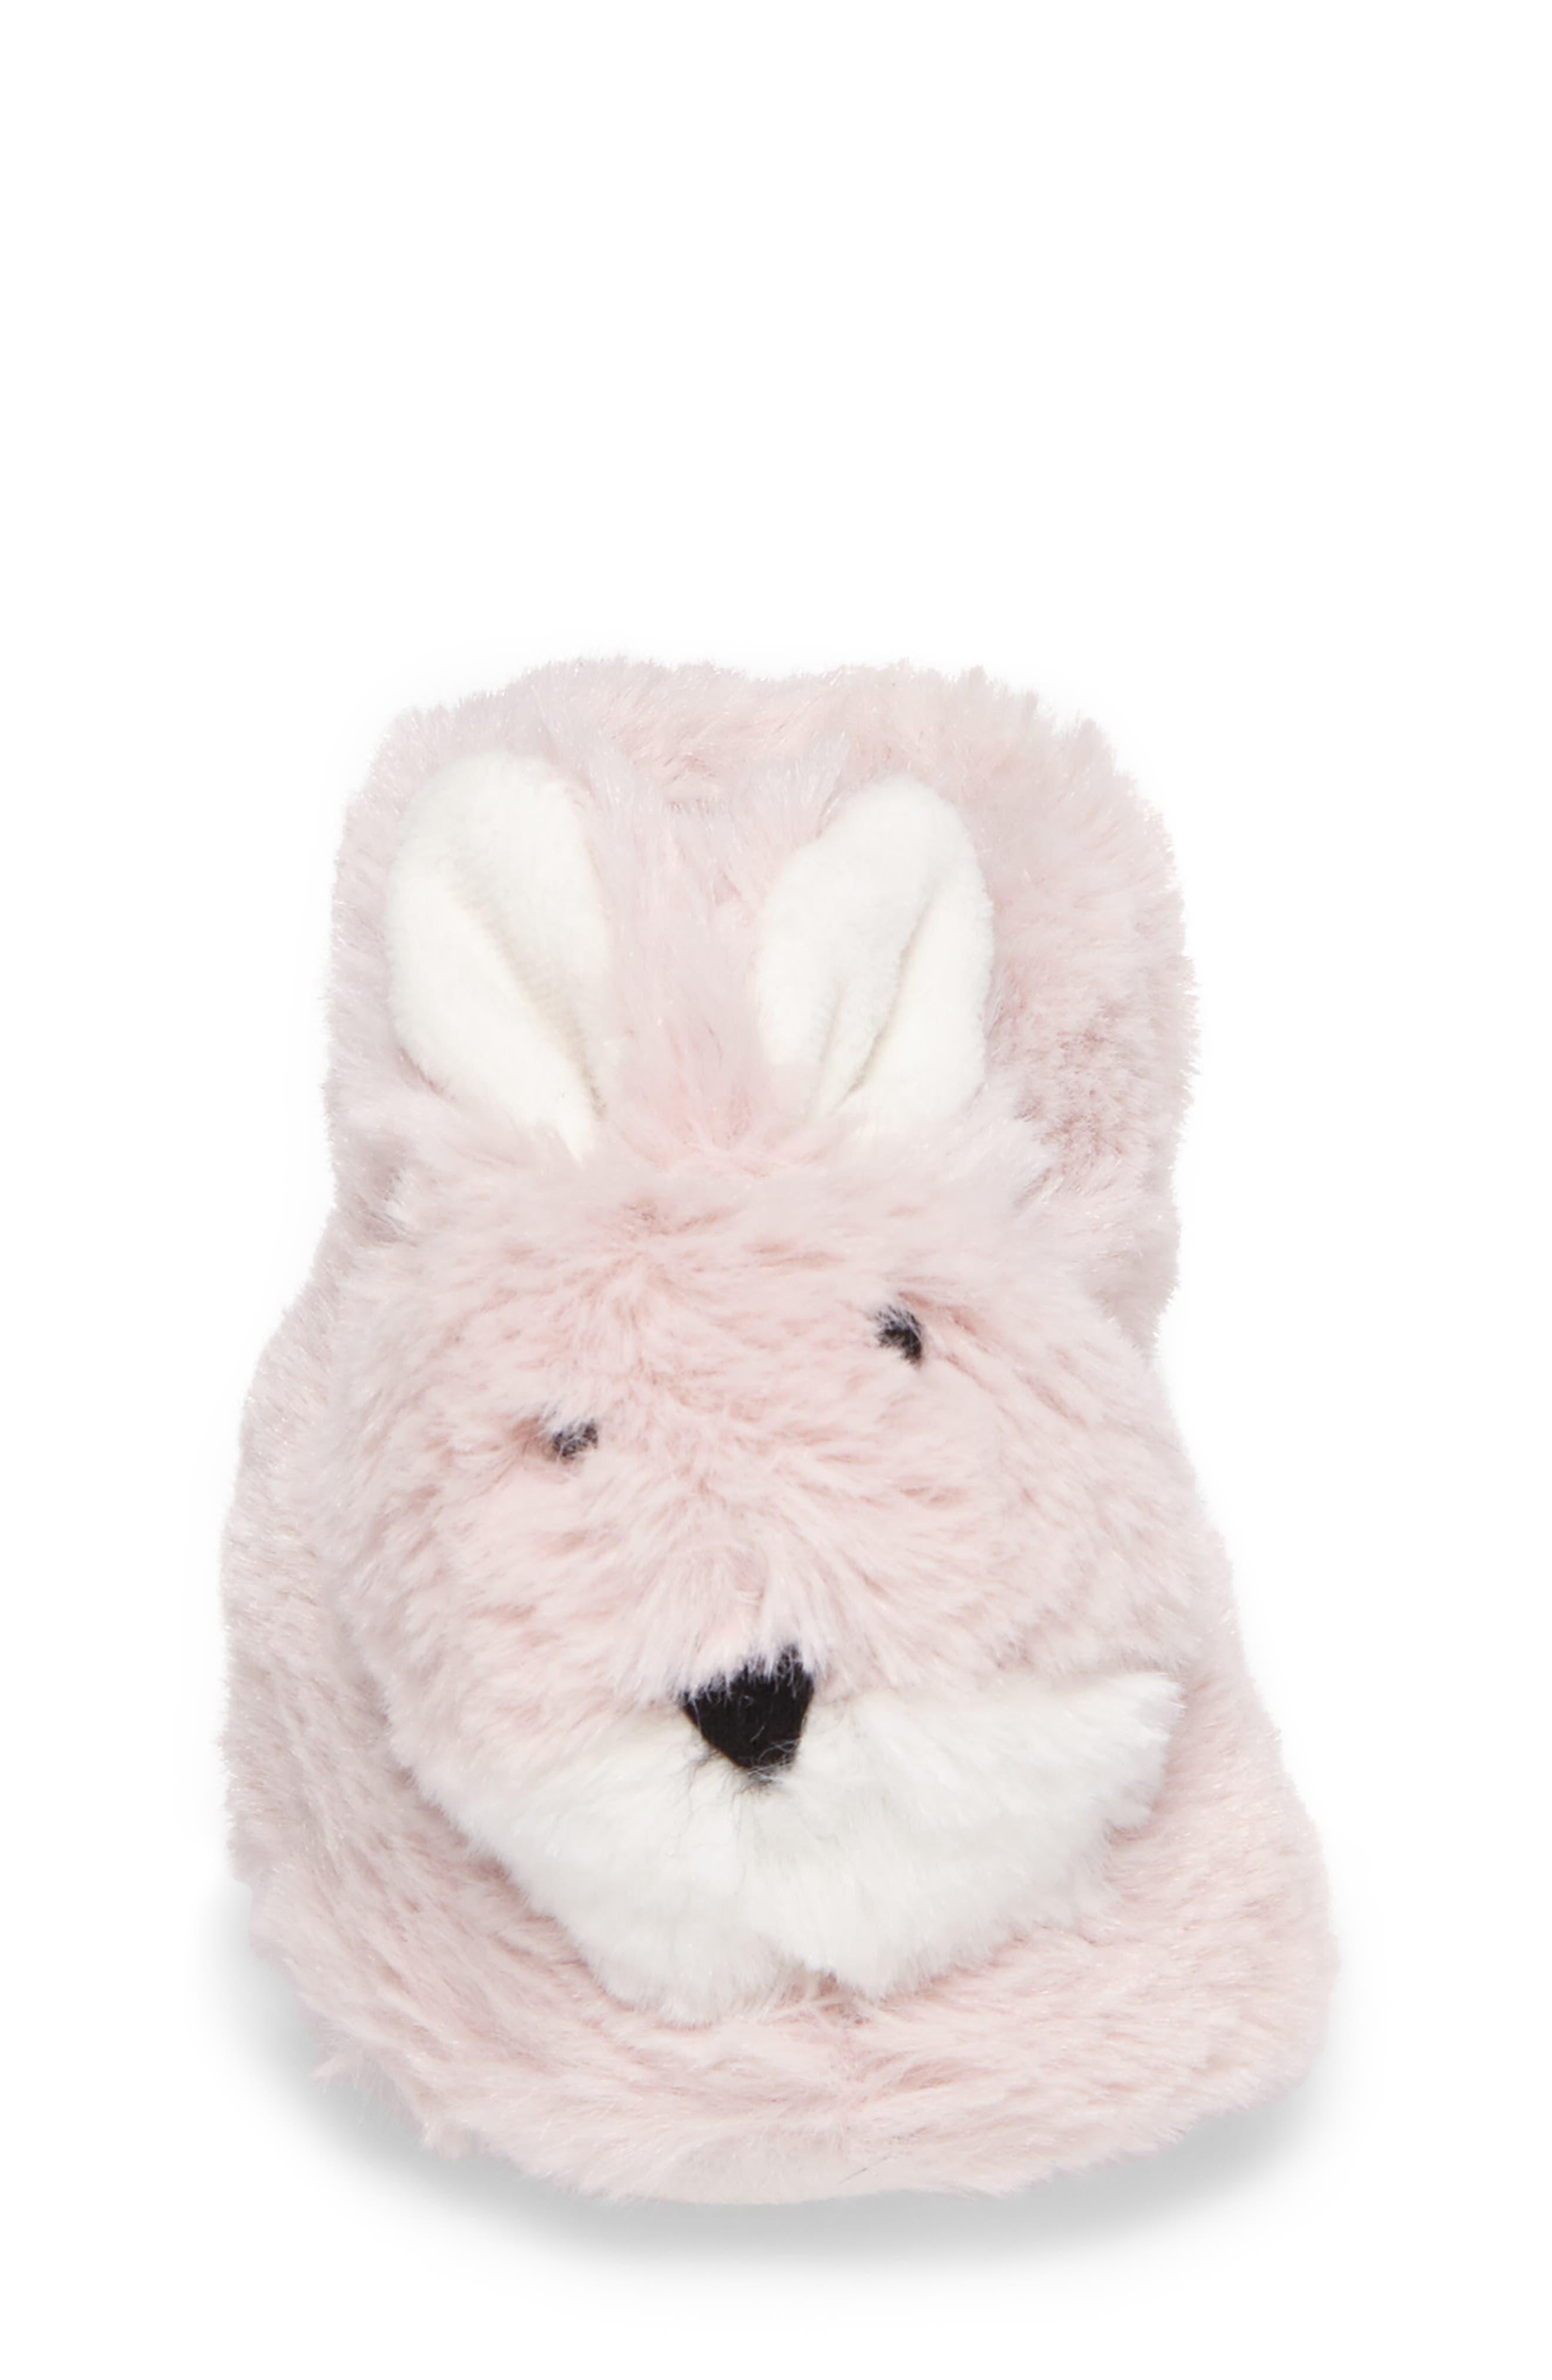 Plush Animal Slipper,                             Alternate thumbnail 4, color,                             Pink Bunny